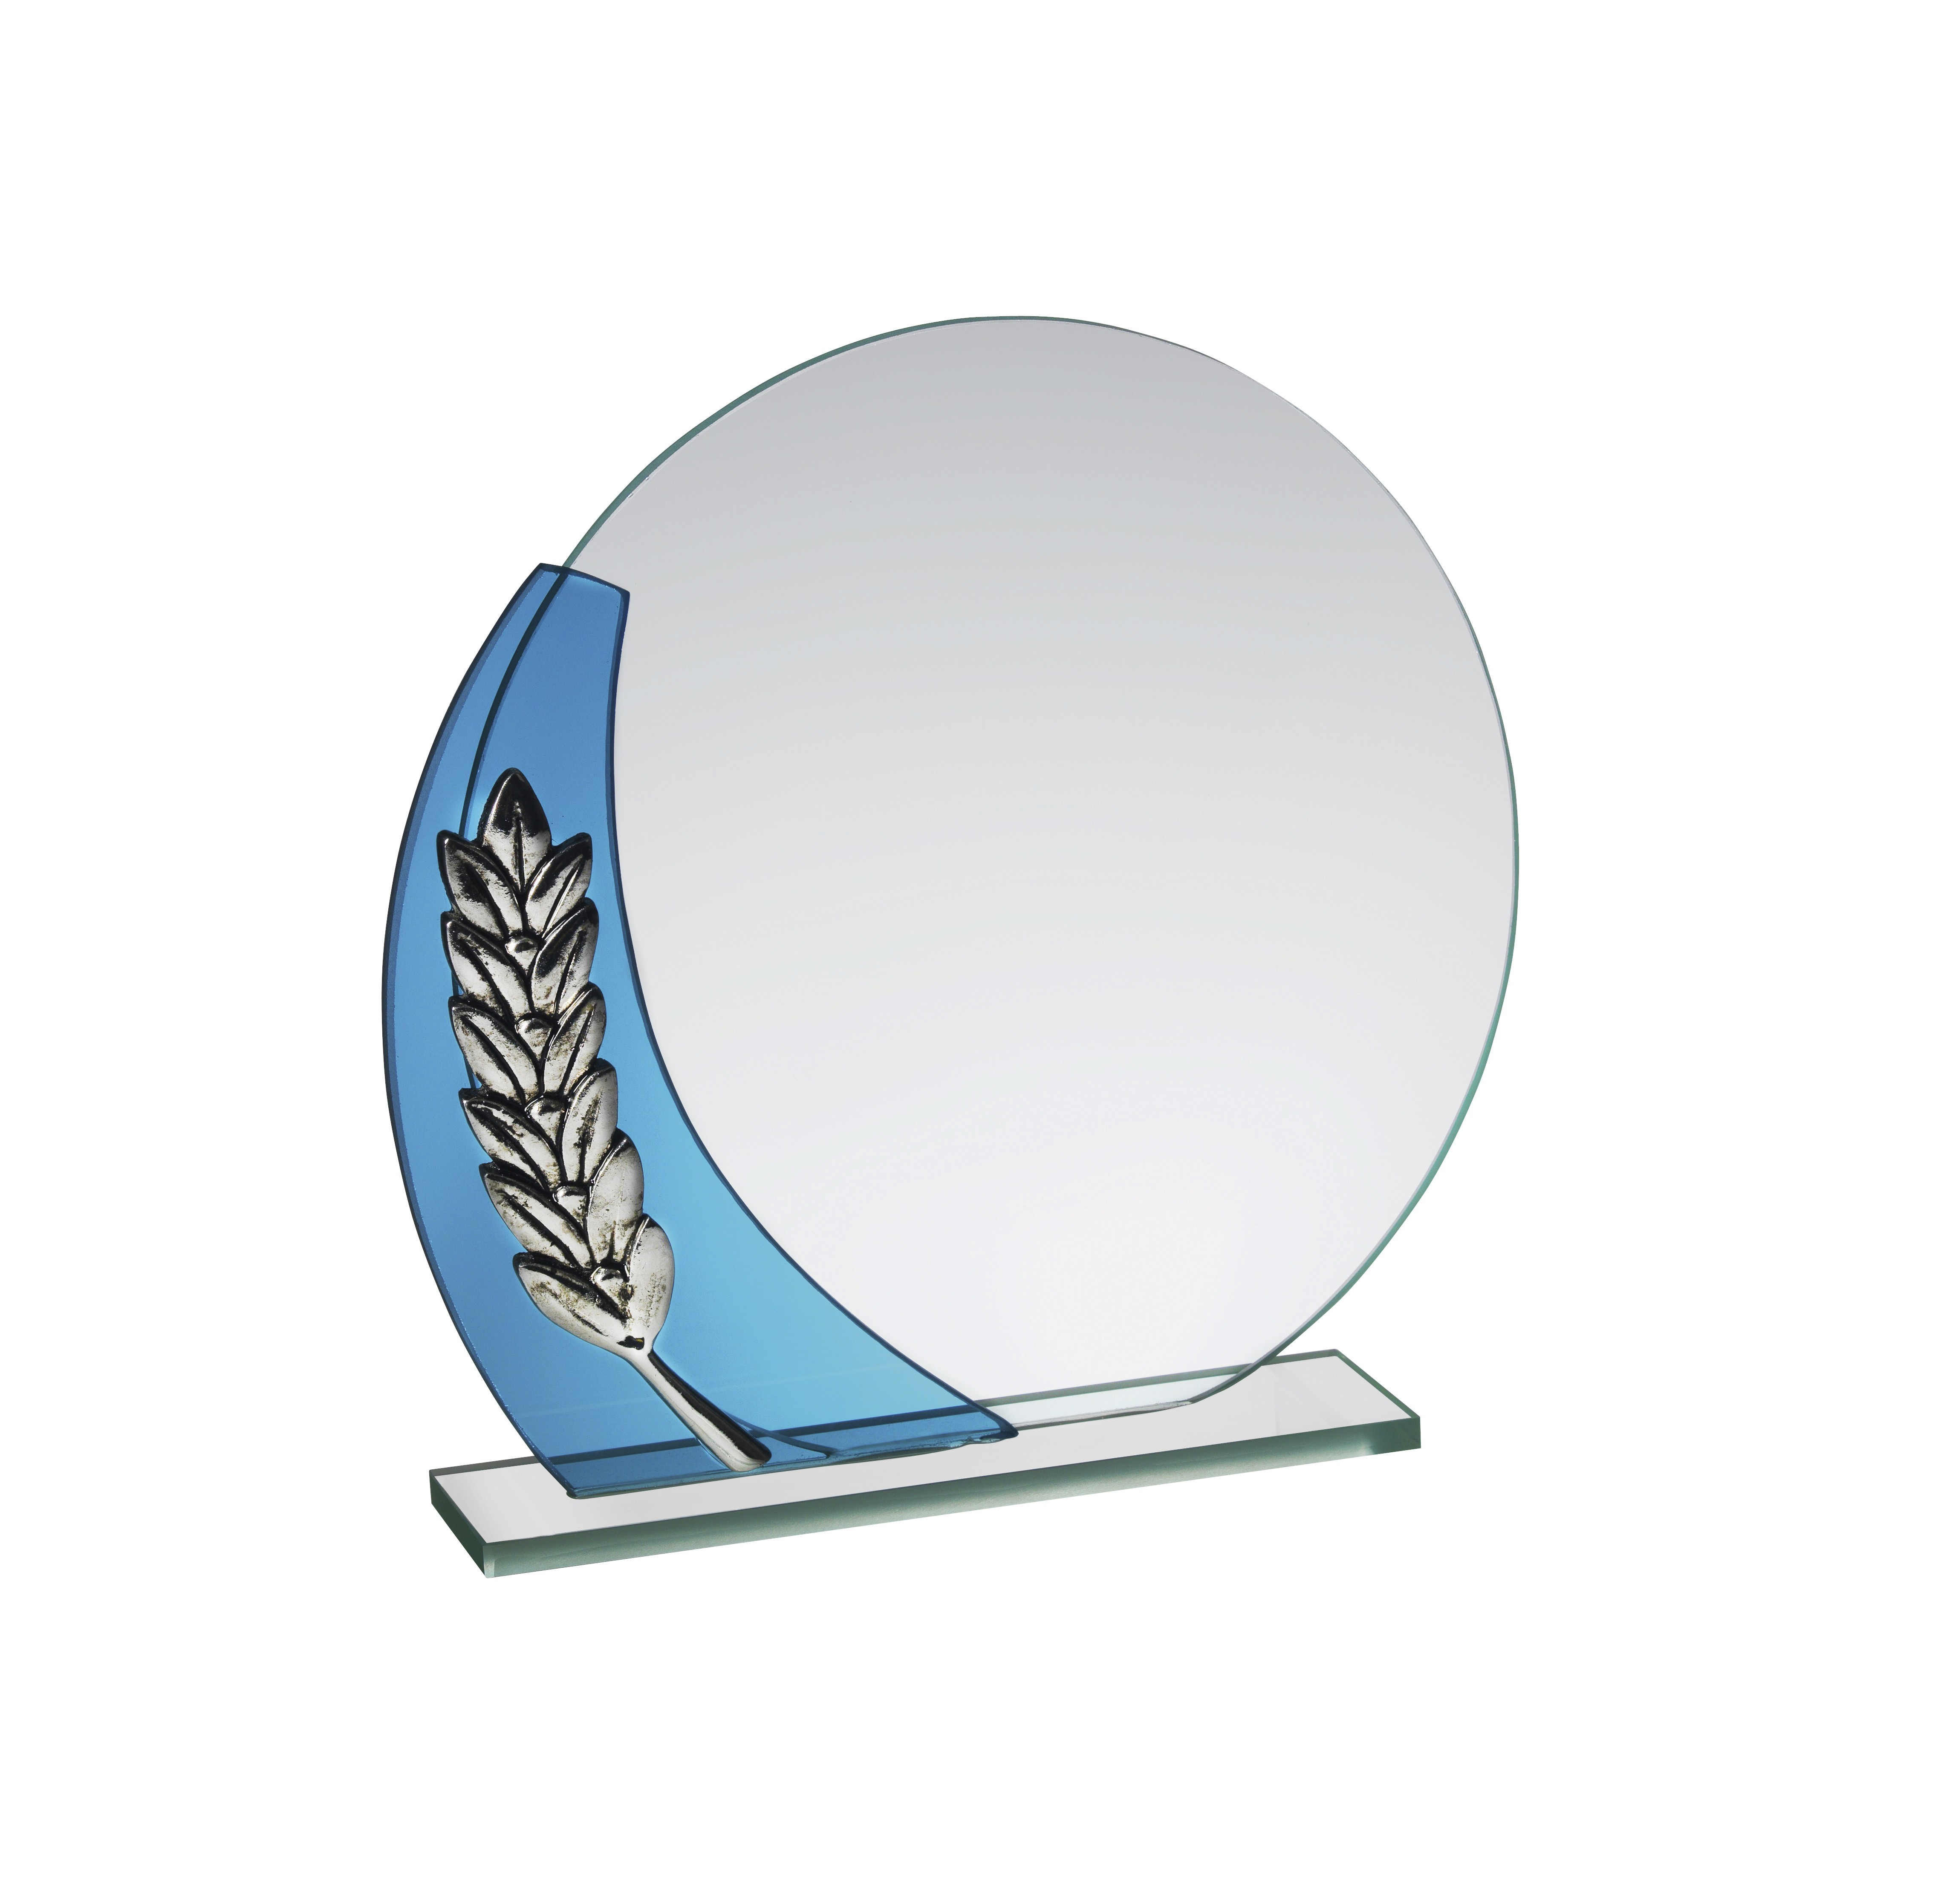 13cm Gls Award with Wreath in Box